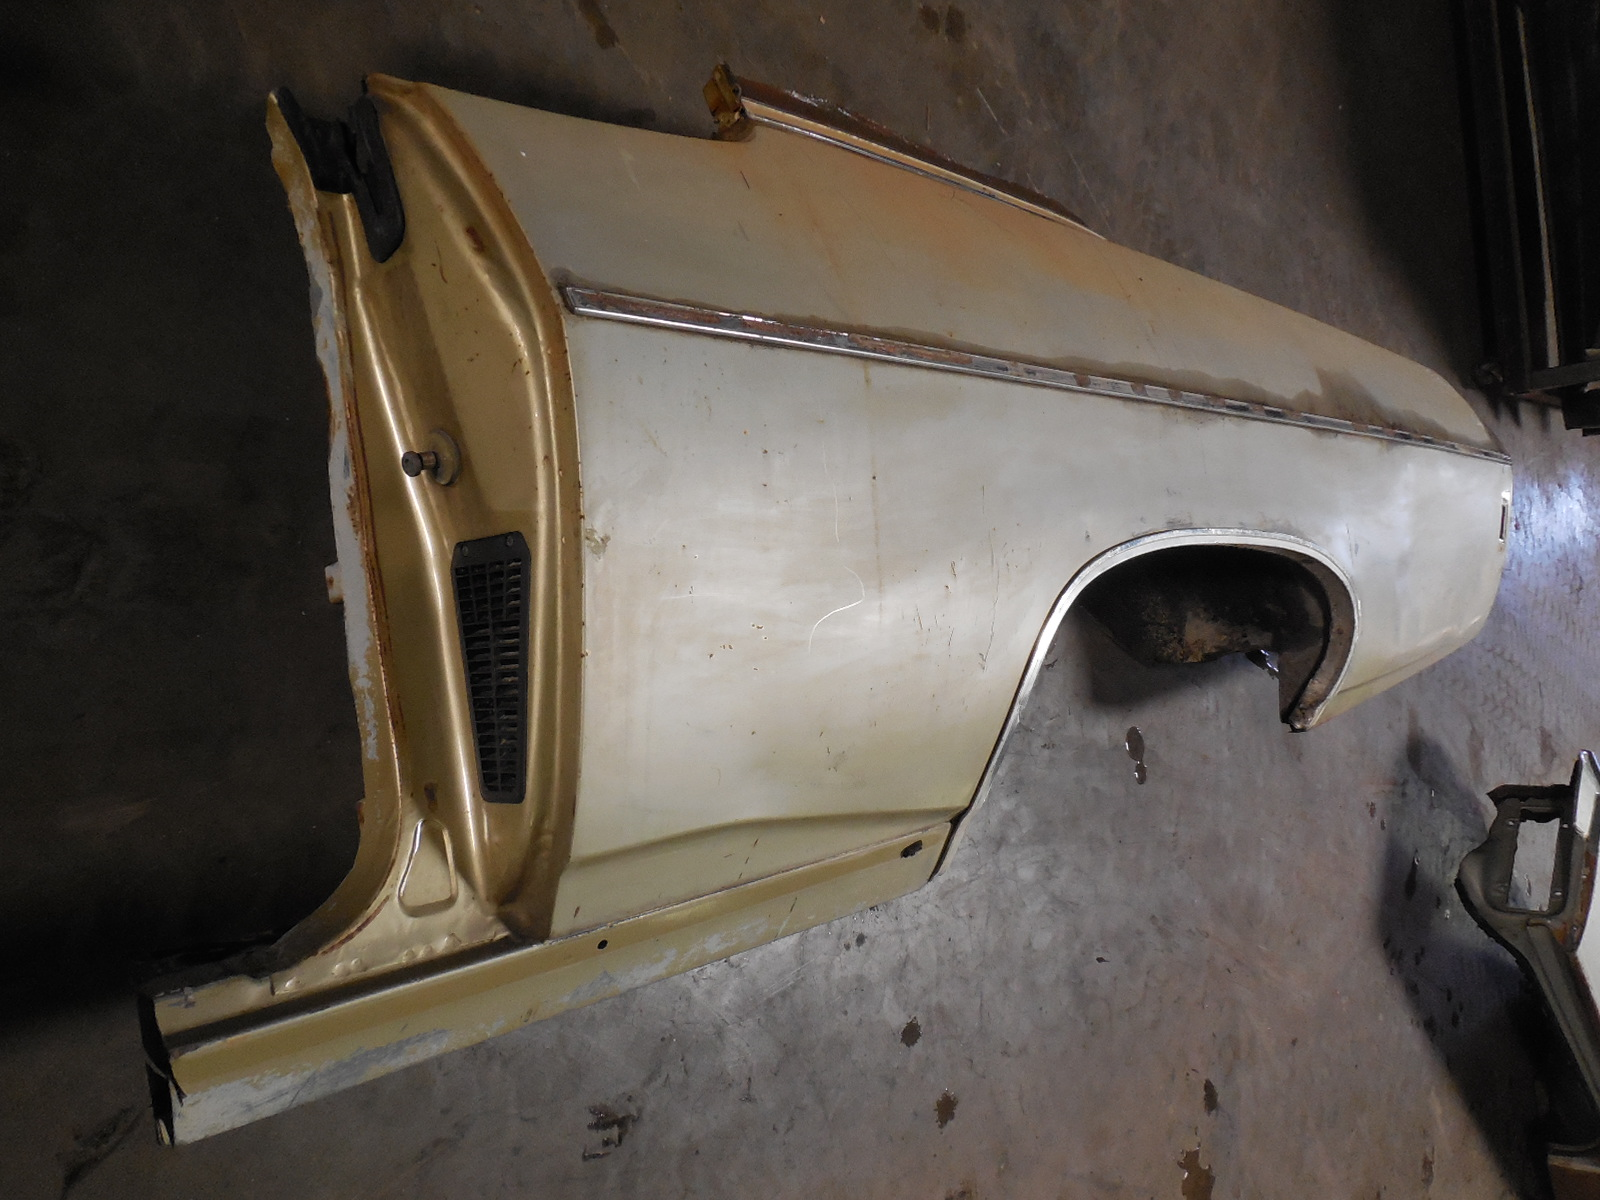 1969 Chevrolet Impala Caprice Quarter Panel | GM Sports